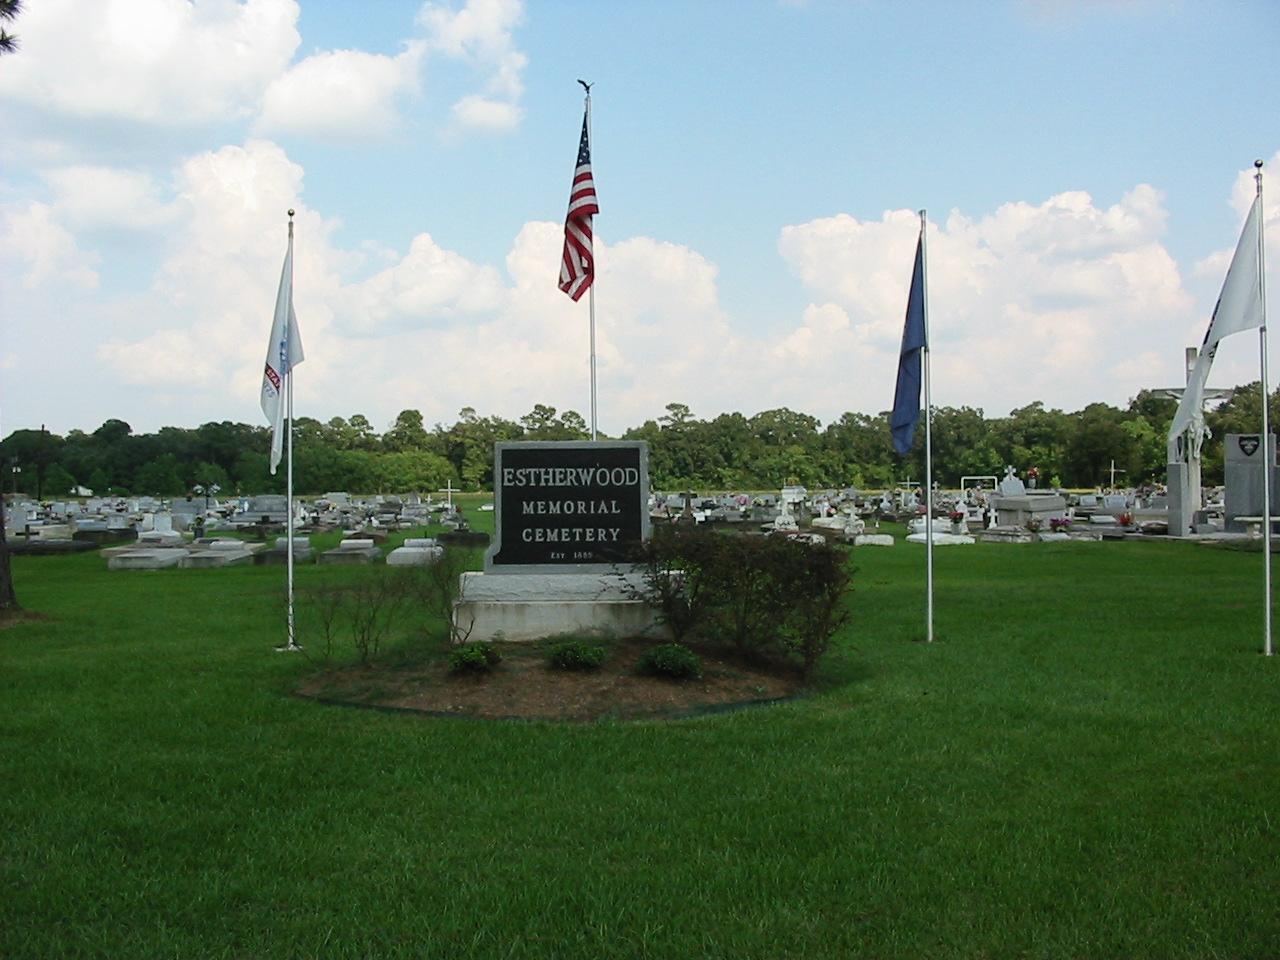 Estherwood Memorial Cemetery